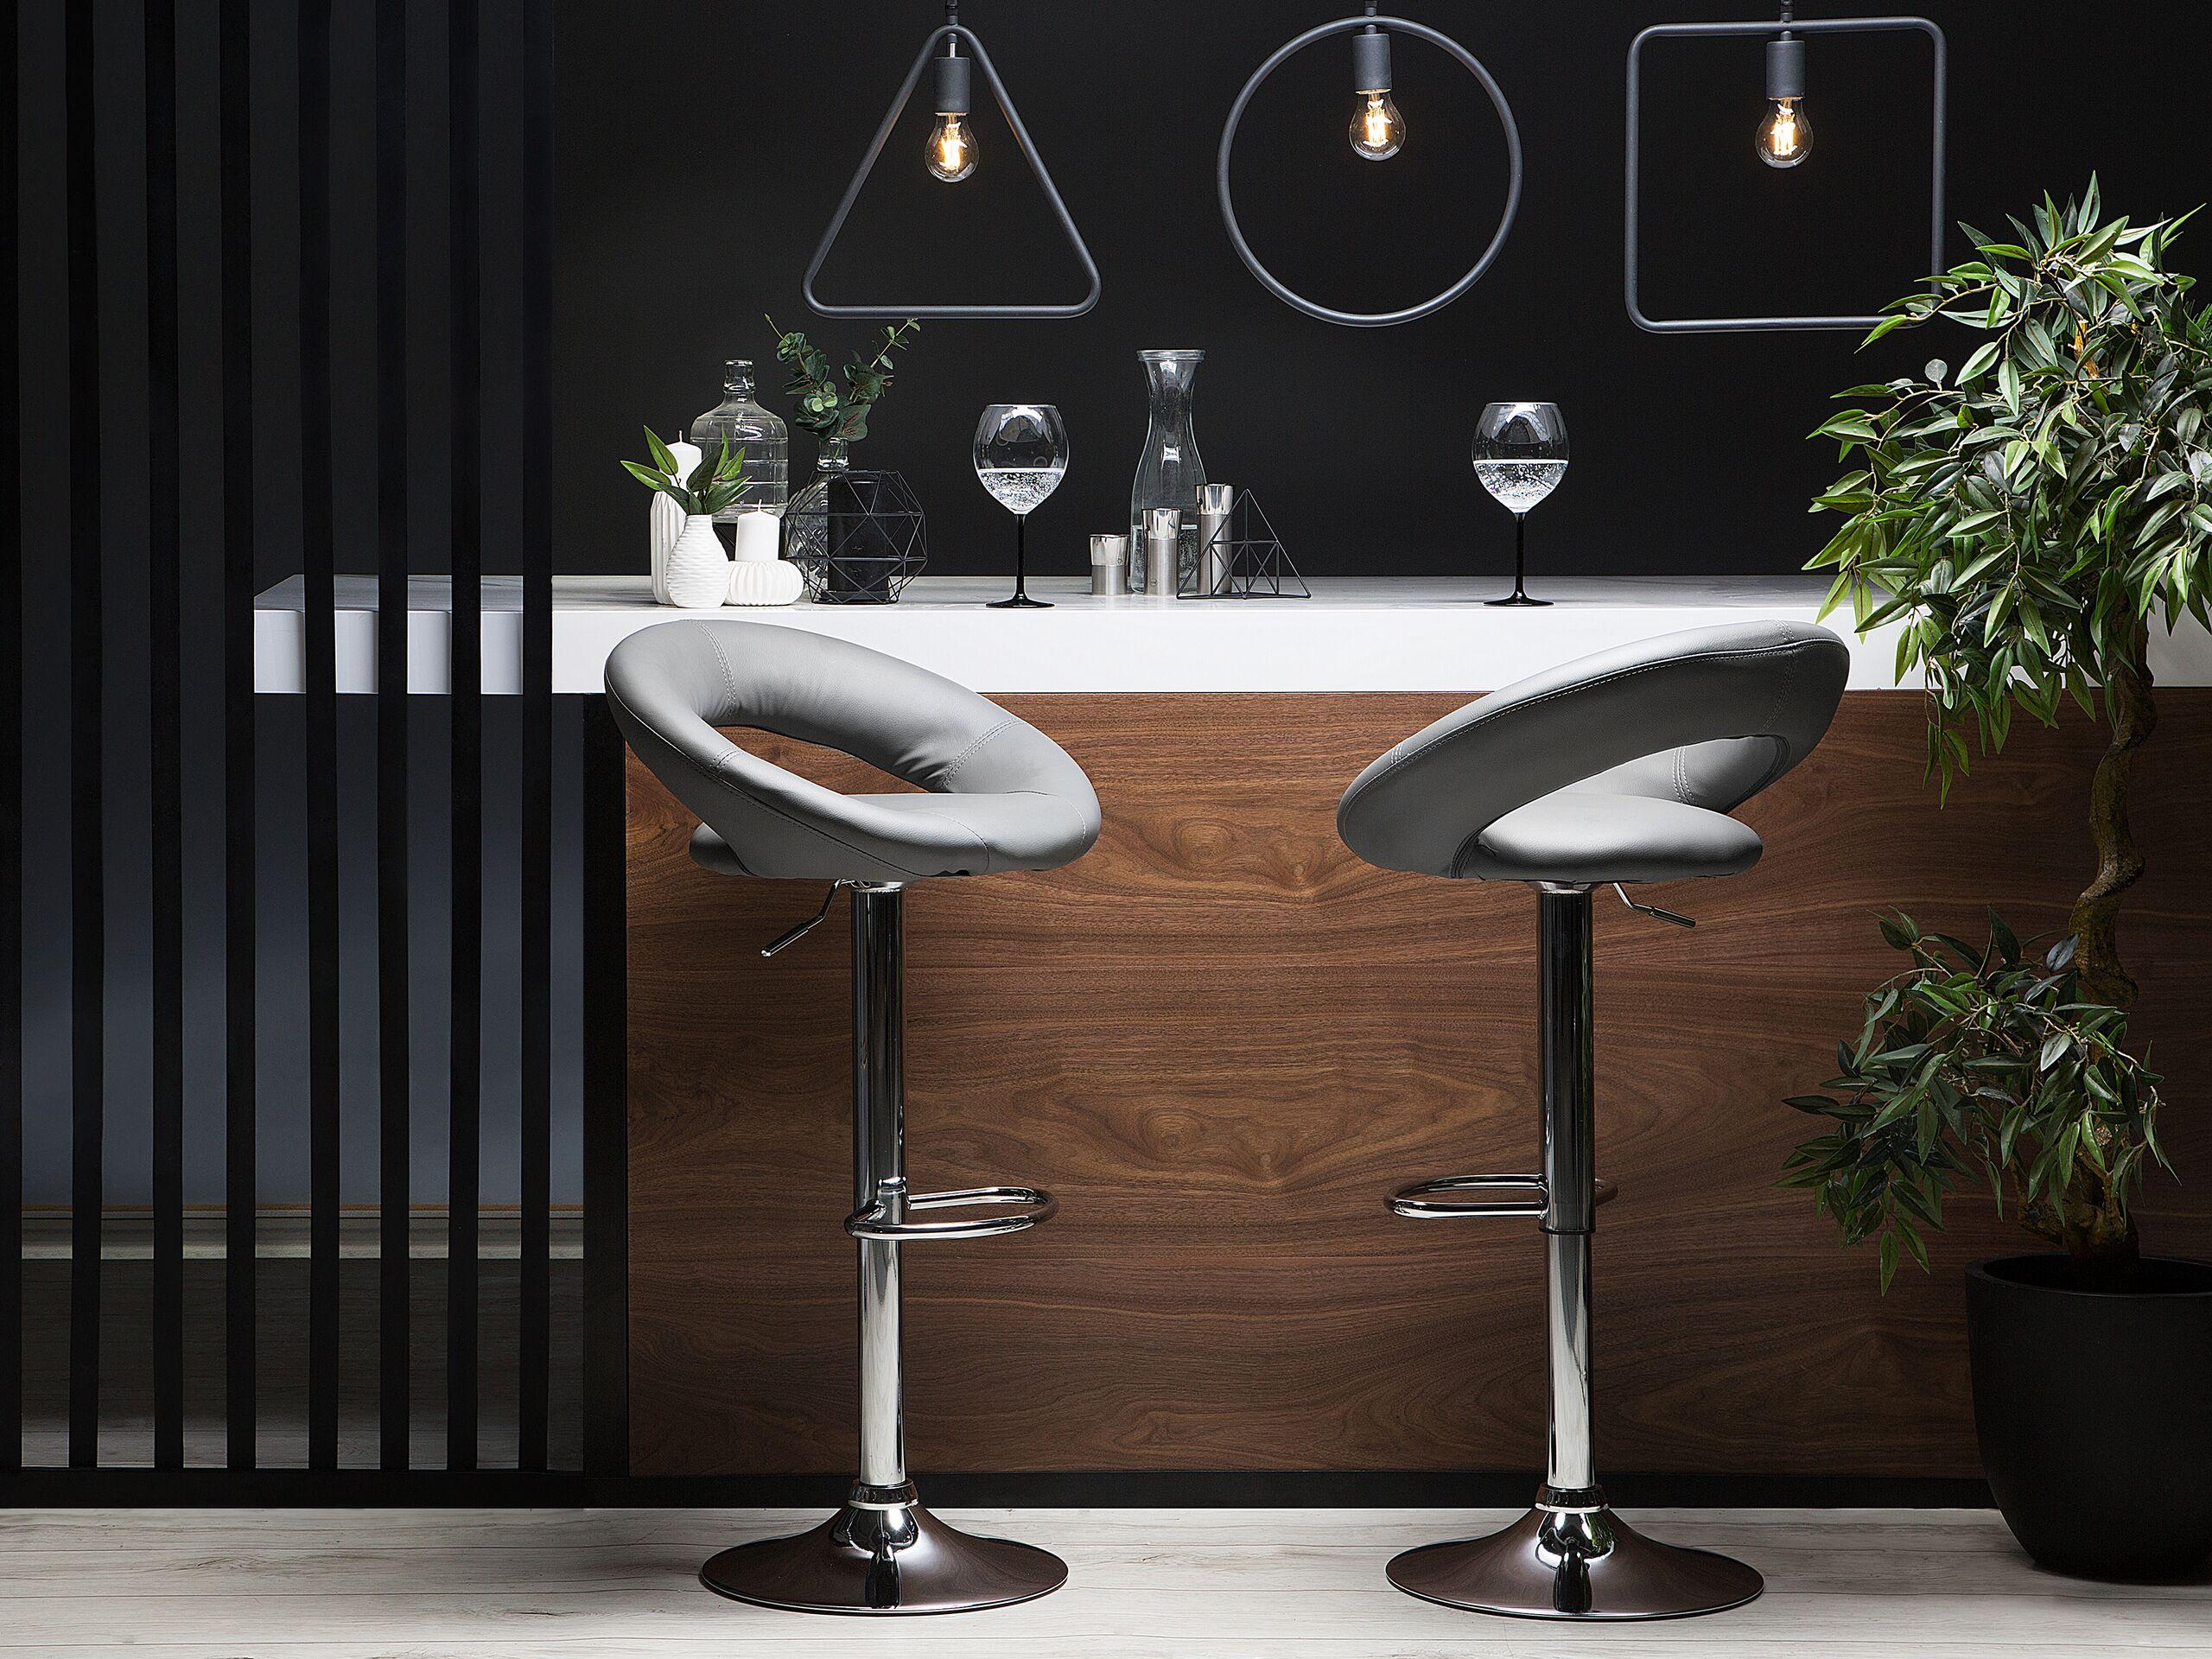 Lot de 2 chaises de bar en simili-cuir gris